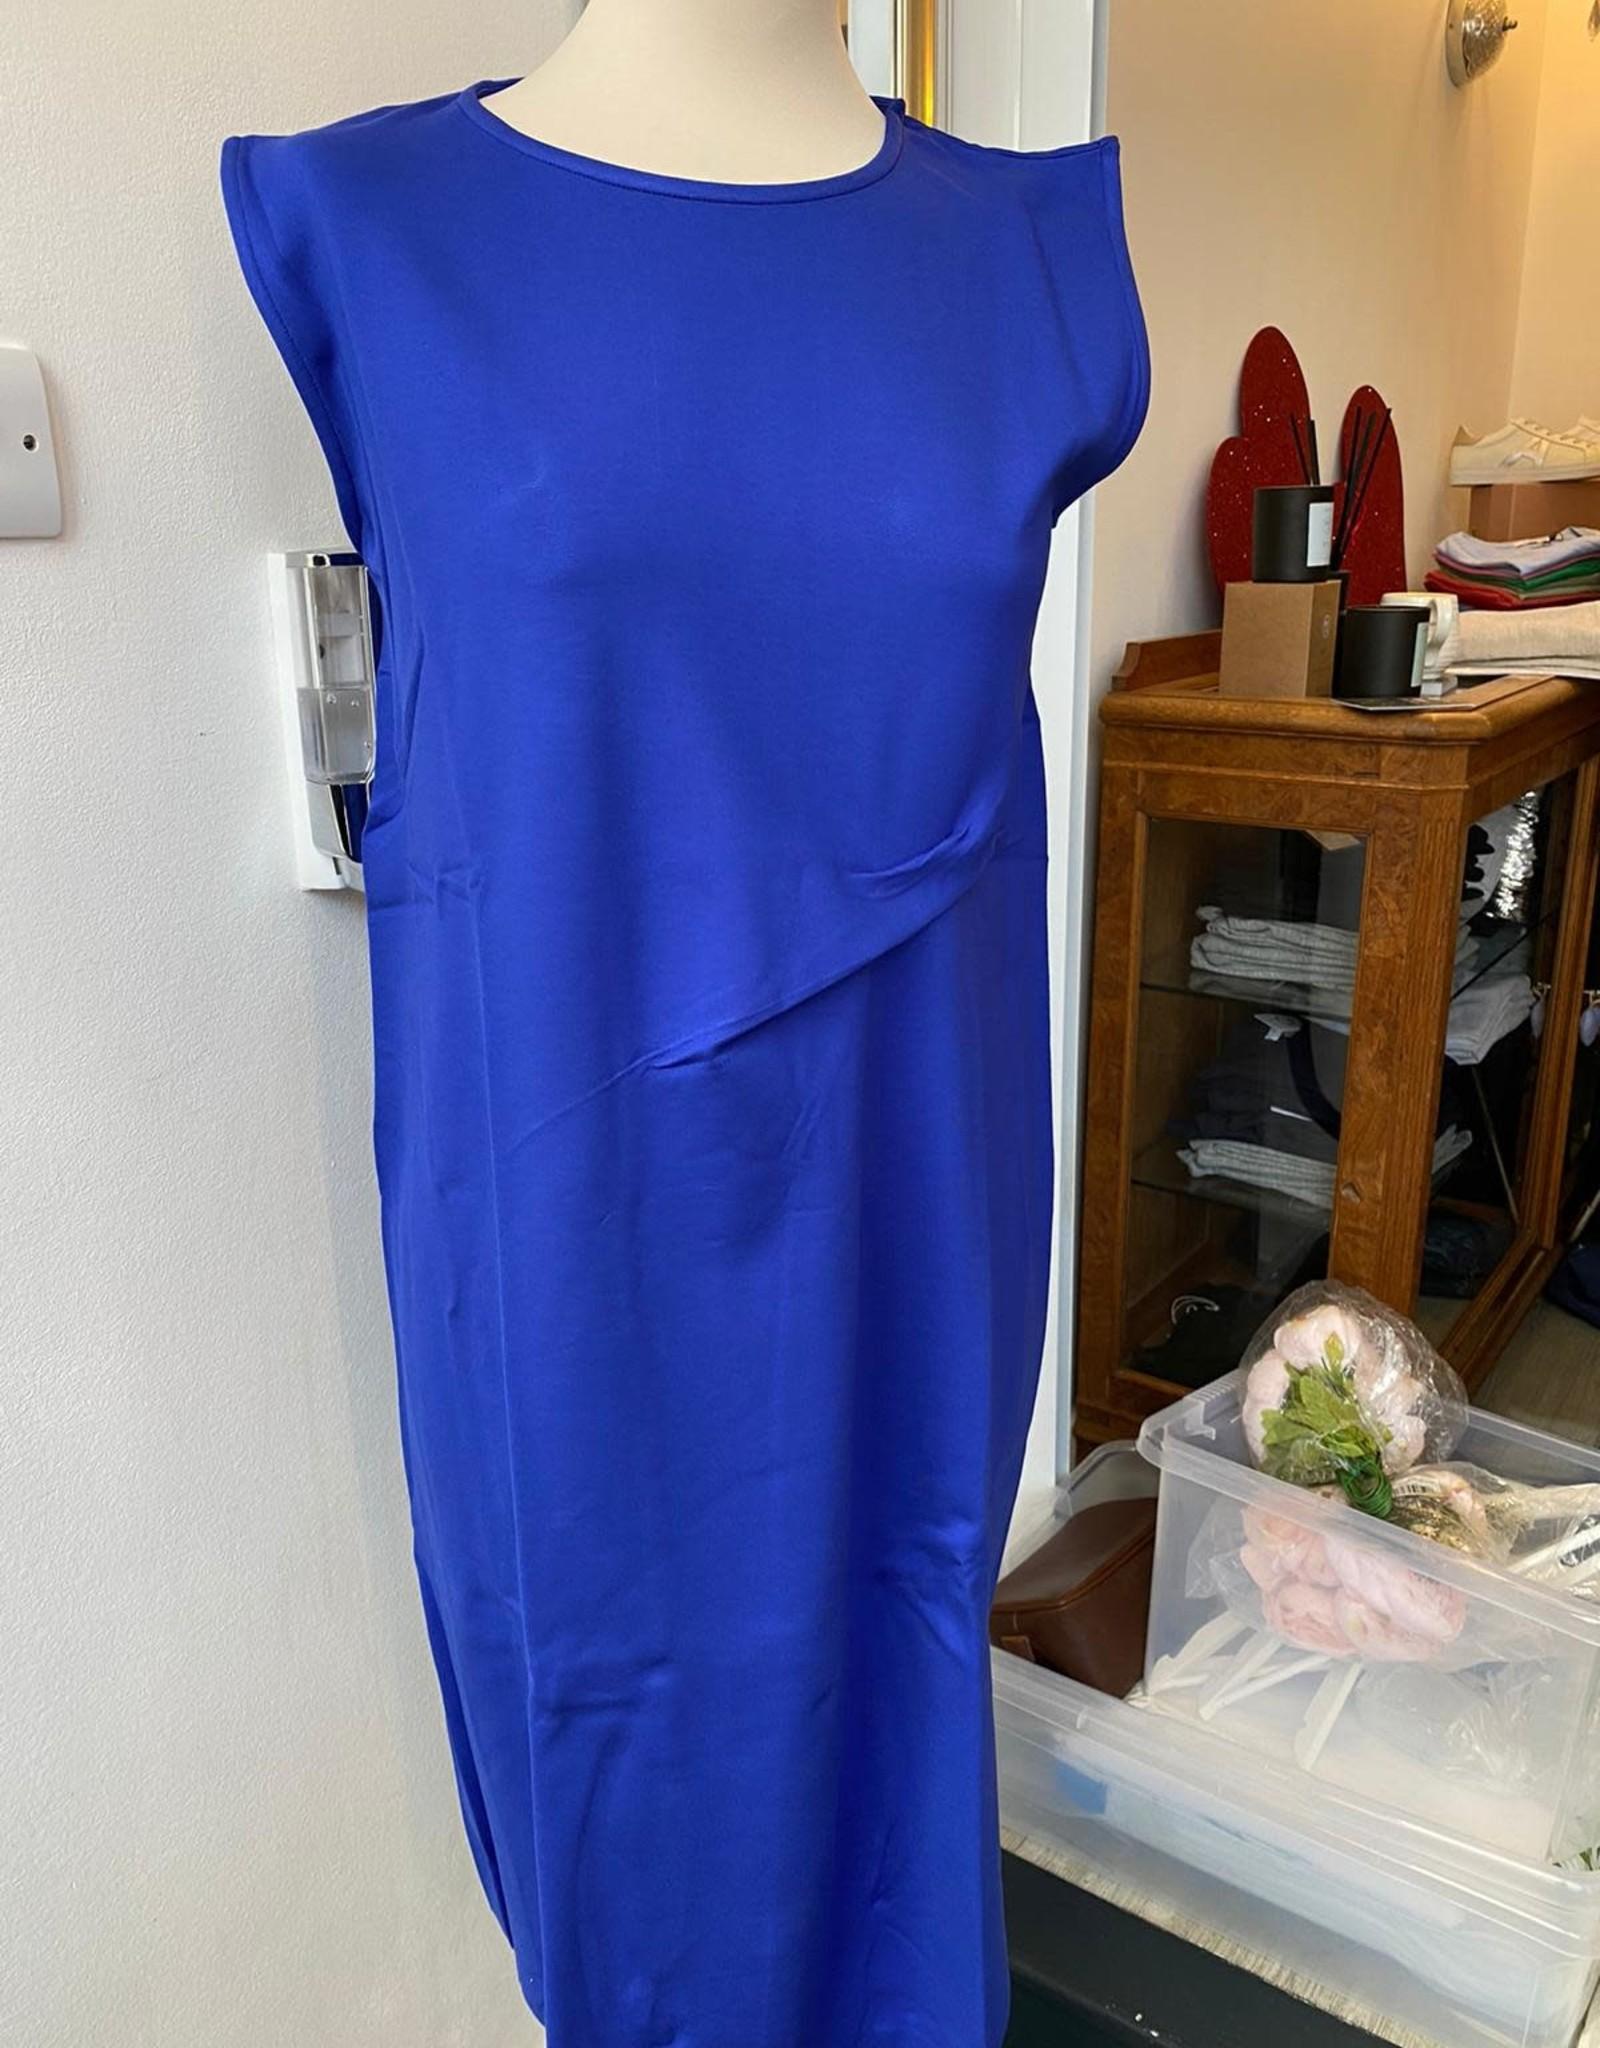 CONCRETO LUXURY PORTUGESE WEAR ABITO DRESS 0908/016